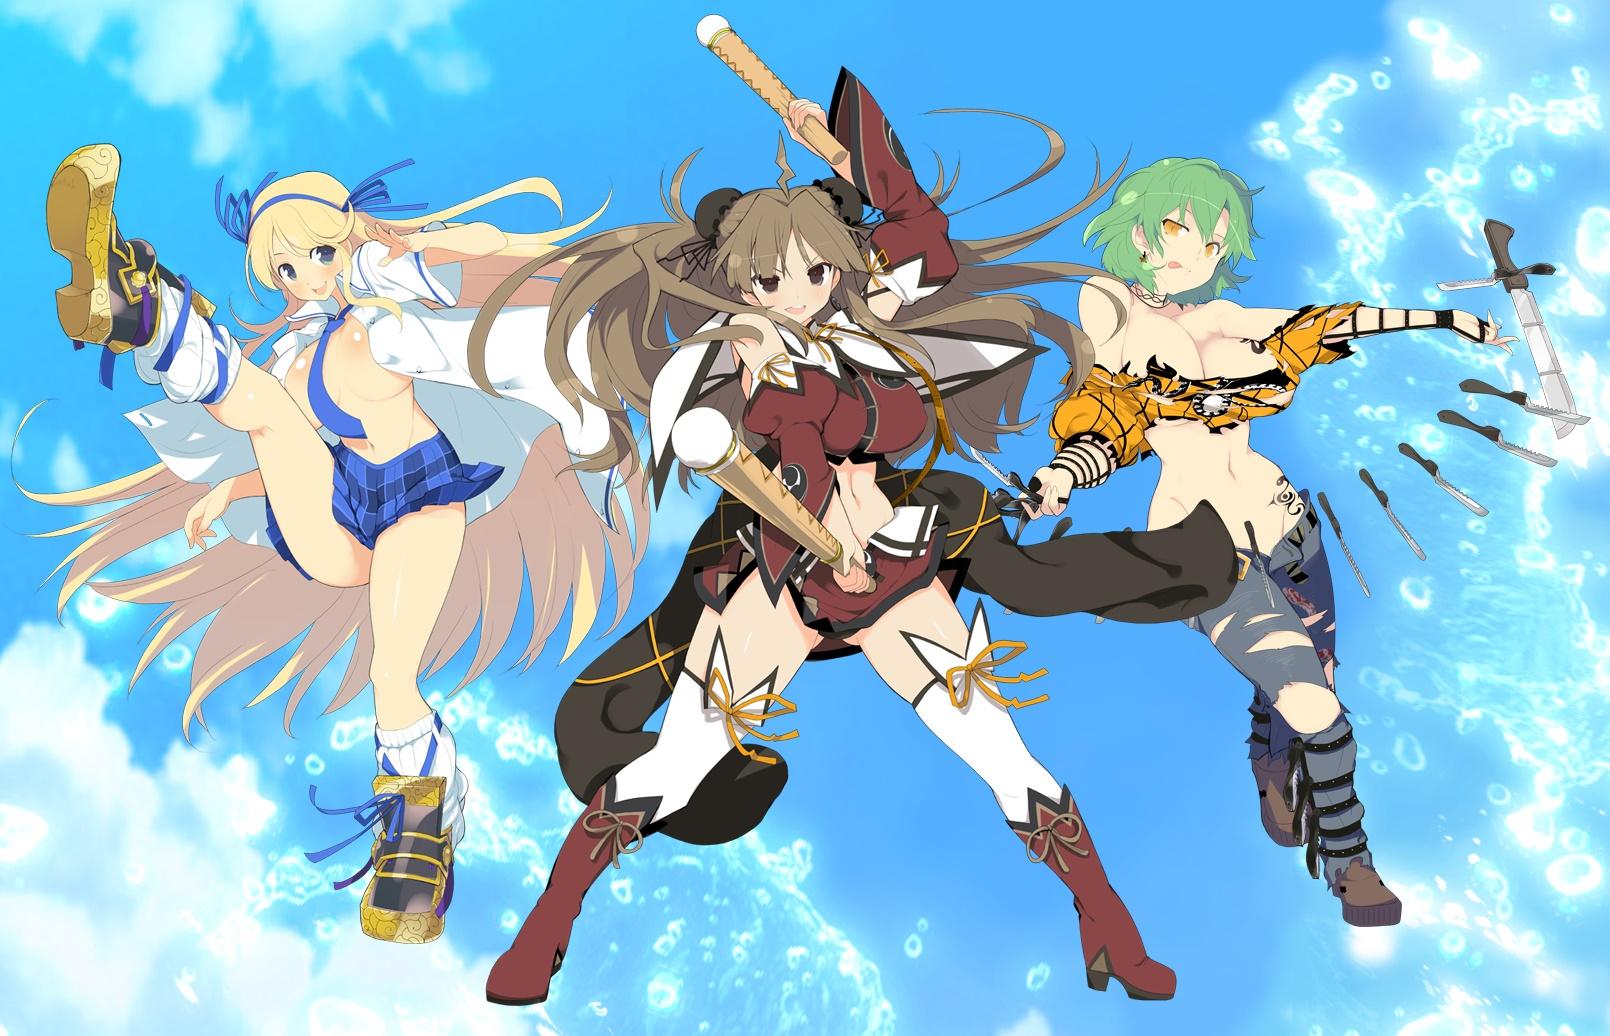 Senran Kagura Estival Versus Update 3 Details Artwork